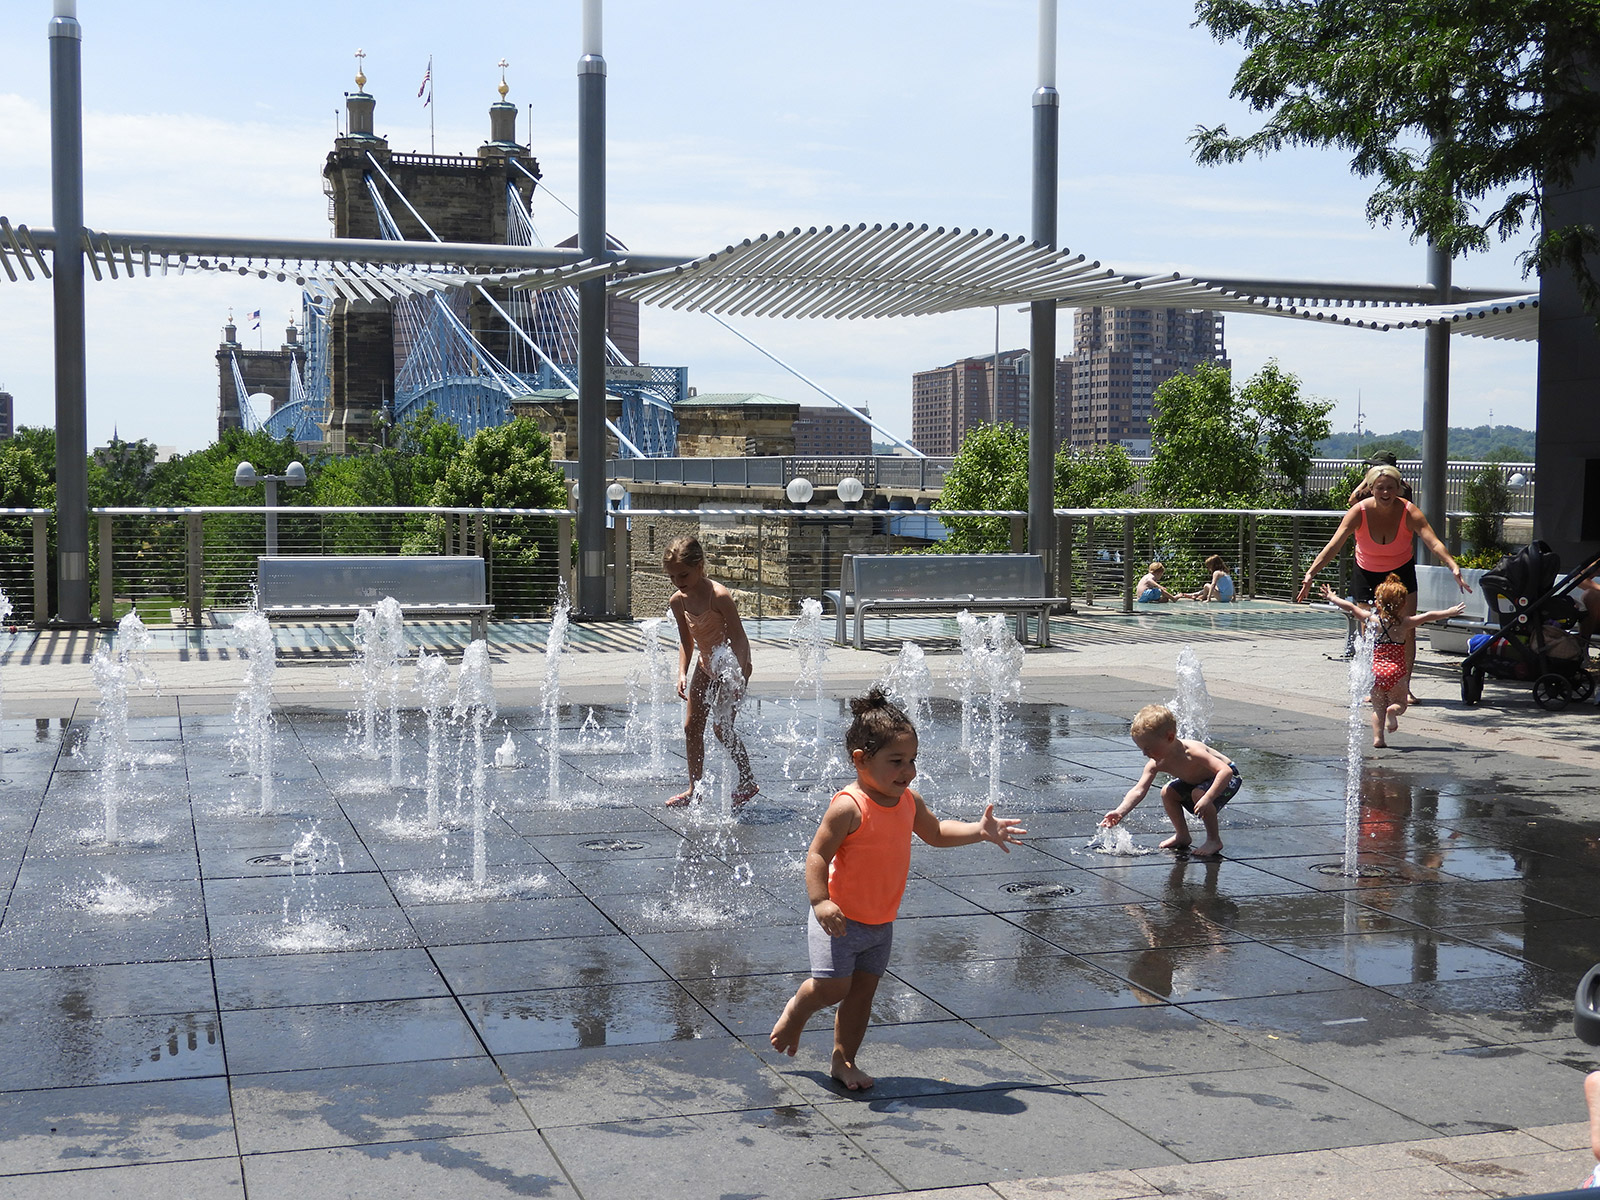 DSCN4421-Splash-Fountain